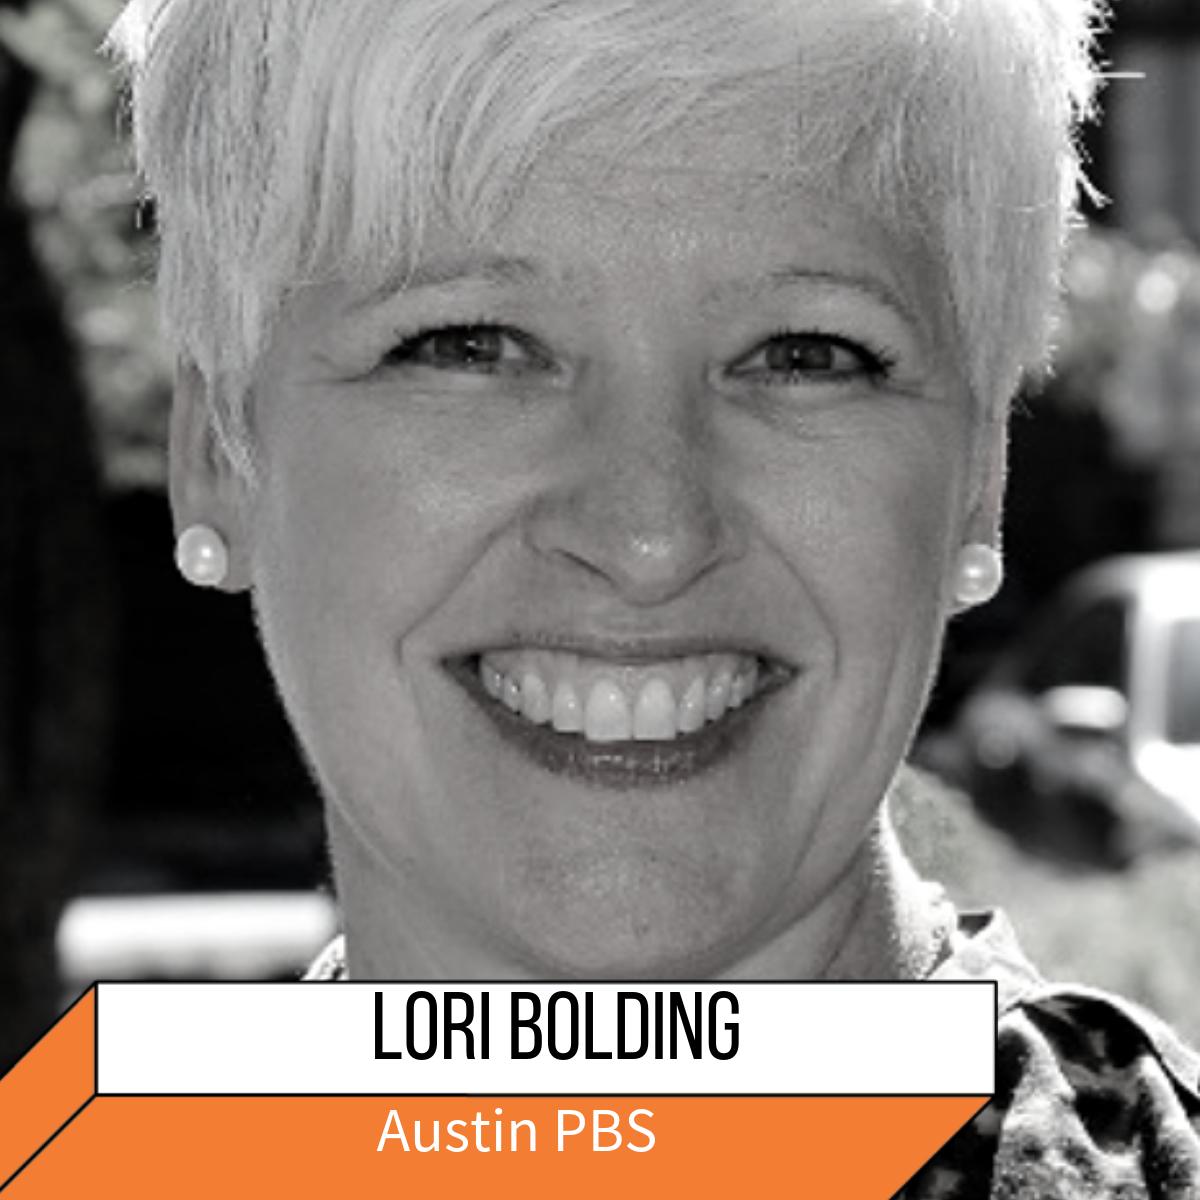 Lori Bolding Org.png